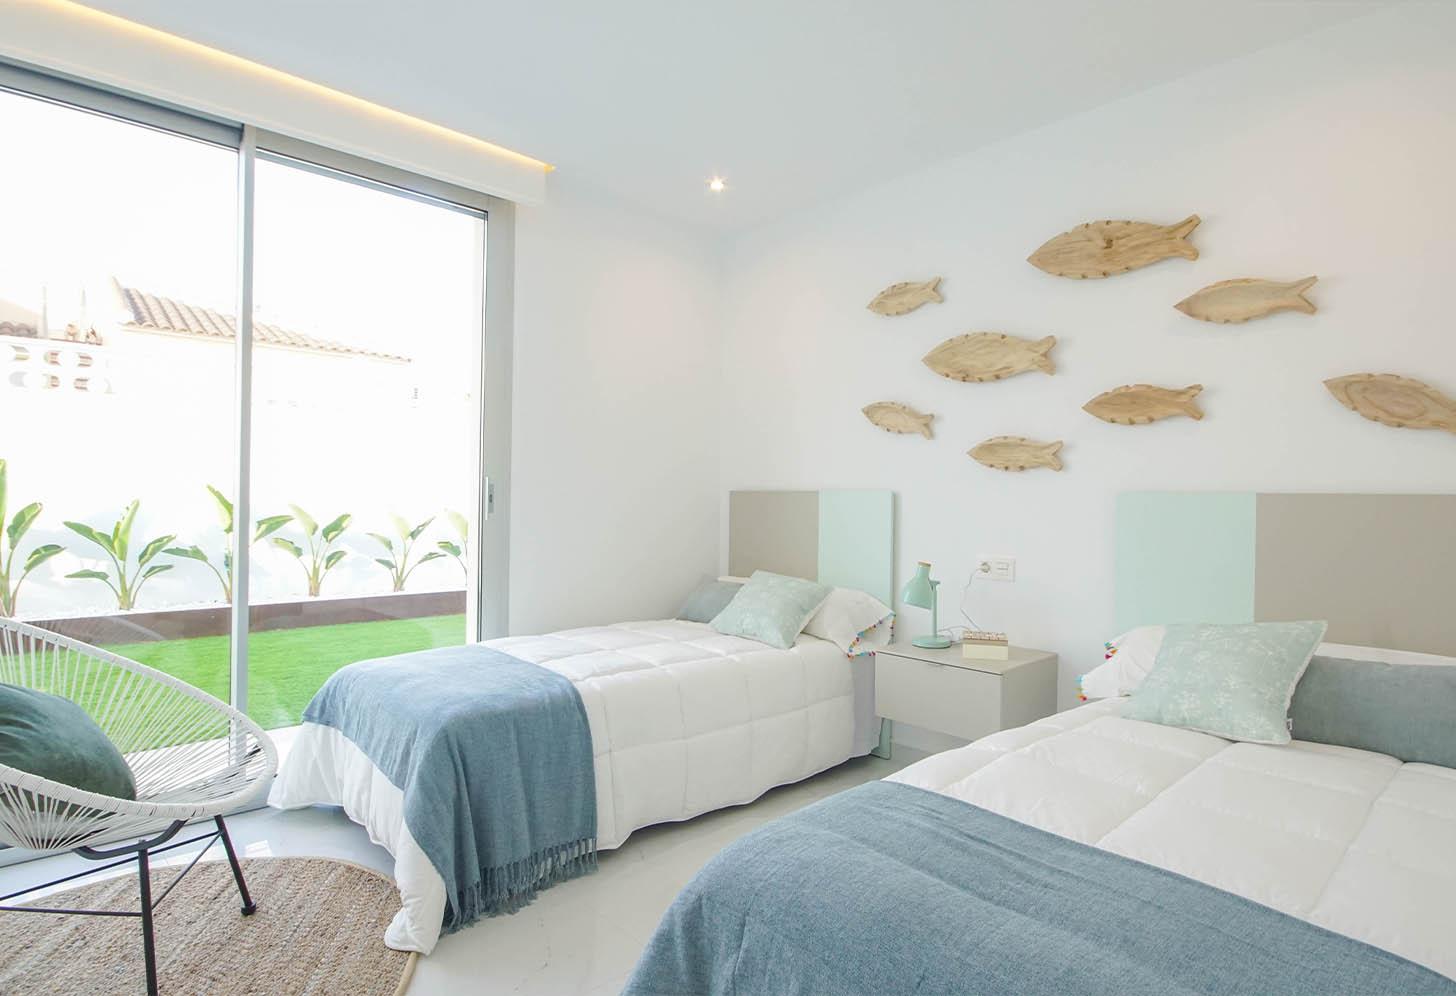 immobilier neuf espagne costa blanca on-k1 gold villas chambre 2